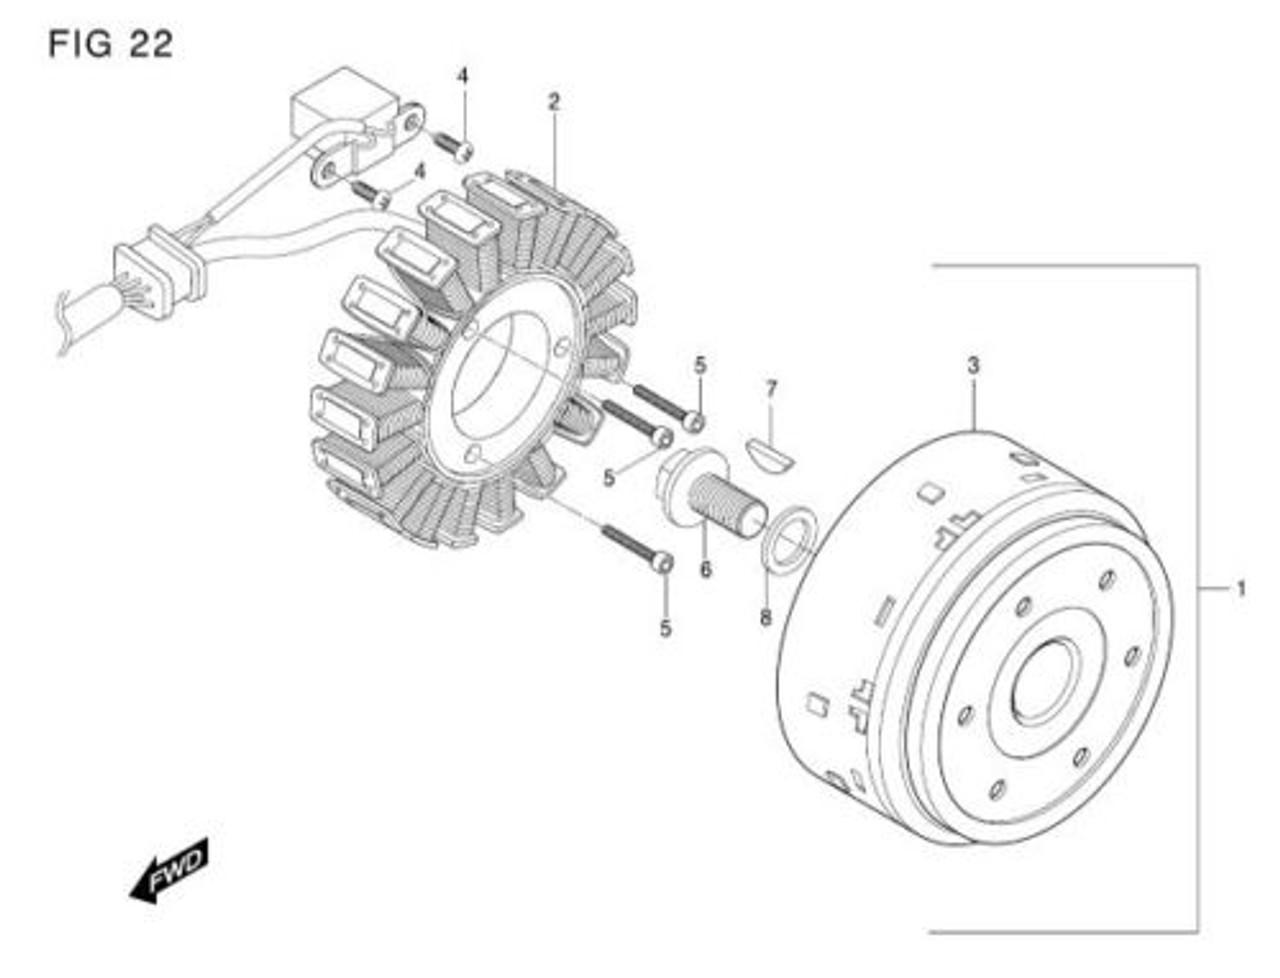 Magneto Flywheel Stator GV650 GT650 GT650R GT650S Assembly